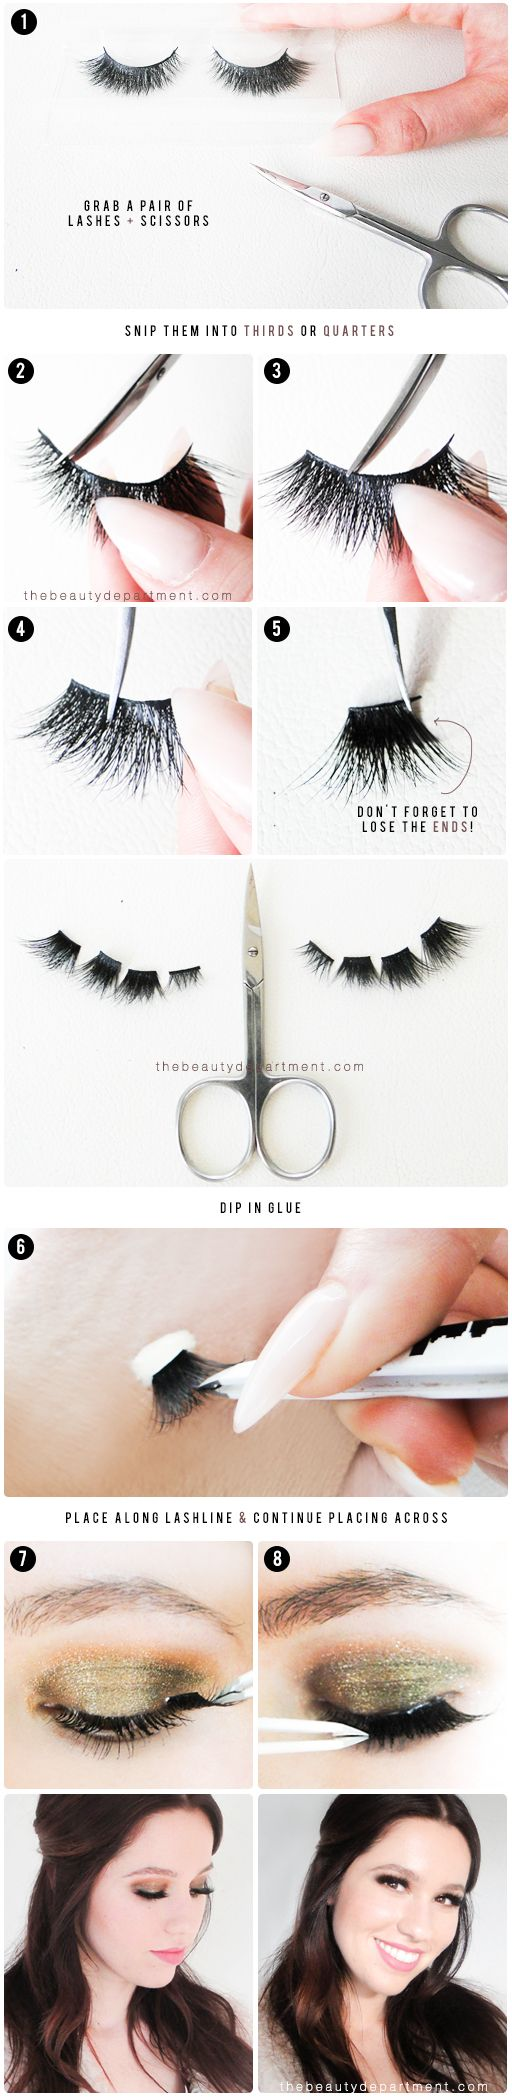 25+ best ideas about Applying false lashes on Pinterest   Applying ...